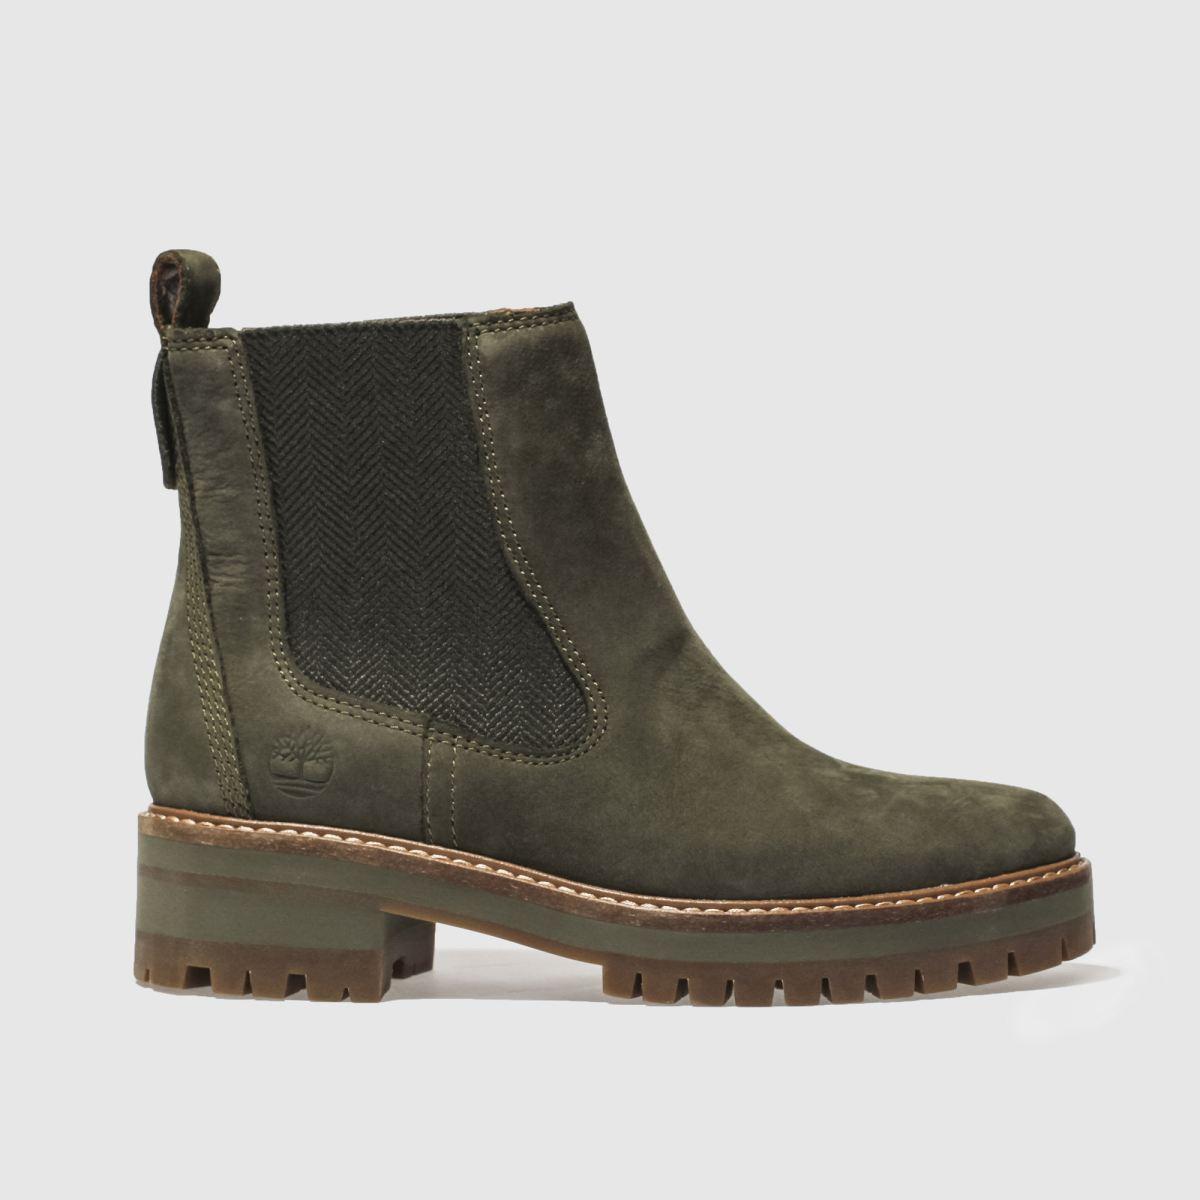 timberland khaki courmayeur valley chelsea boots